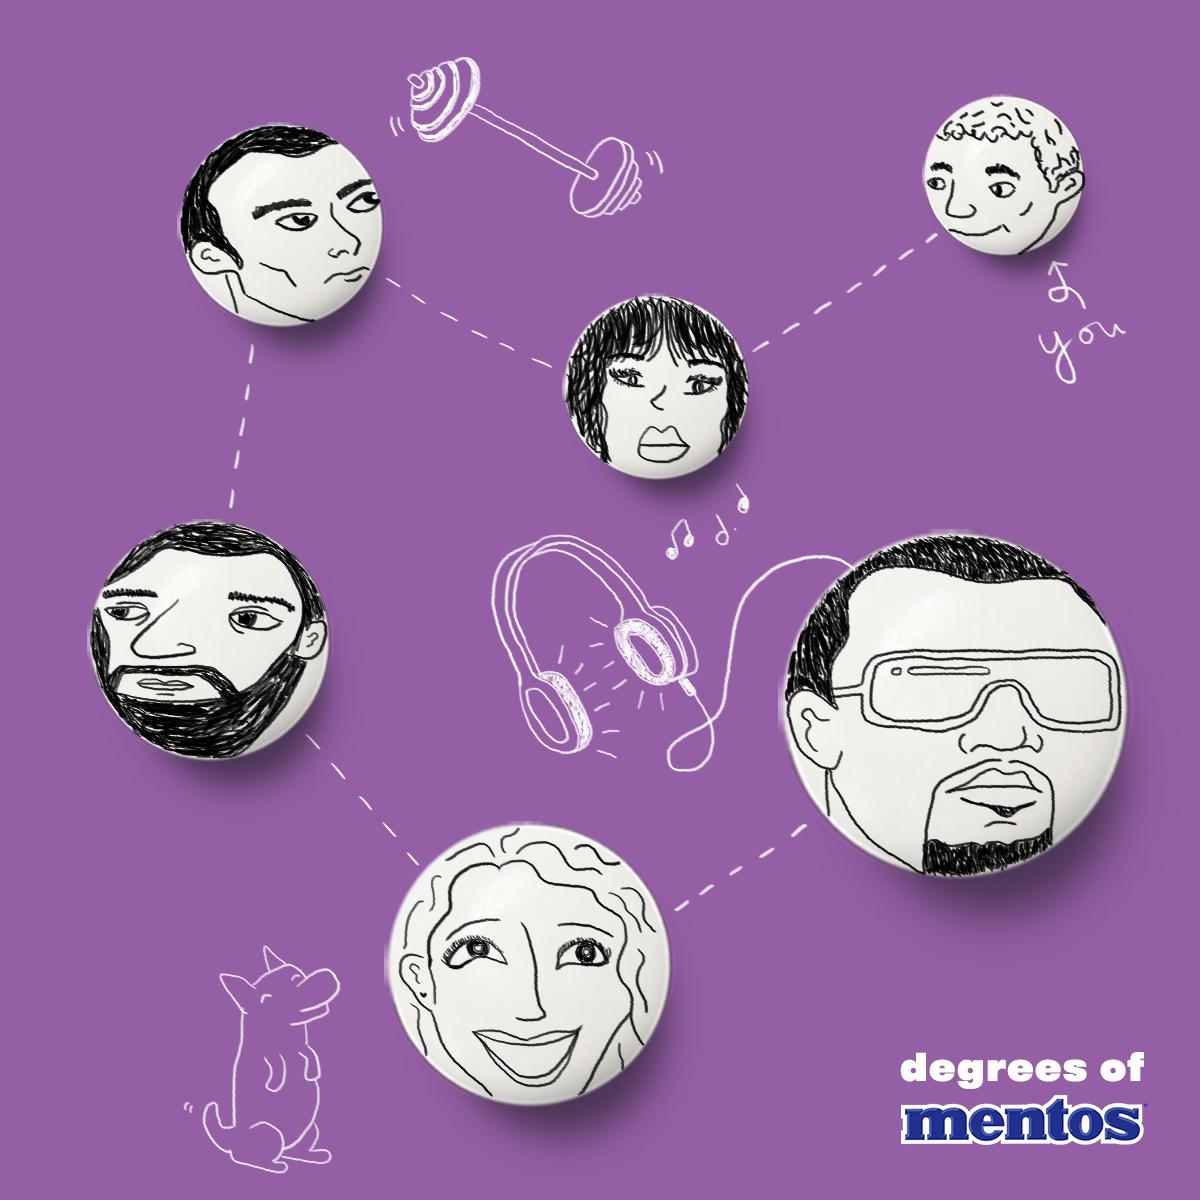 Mentos-6degrees-hiphop.png